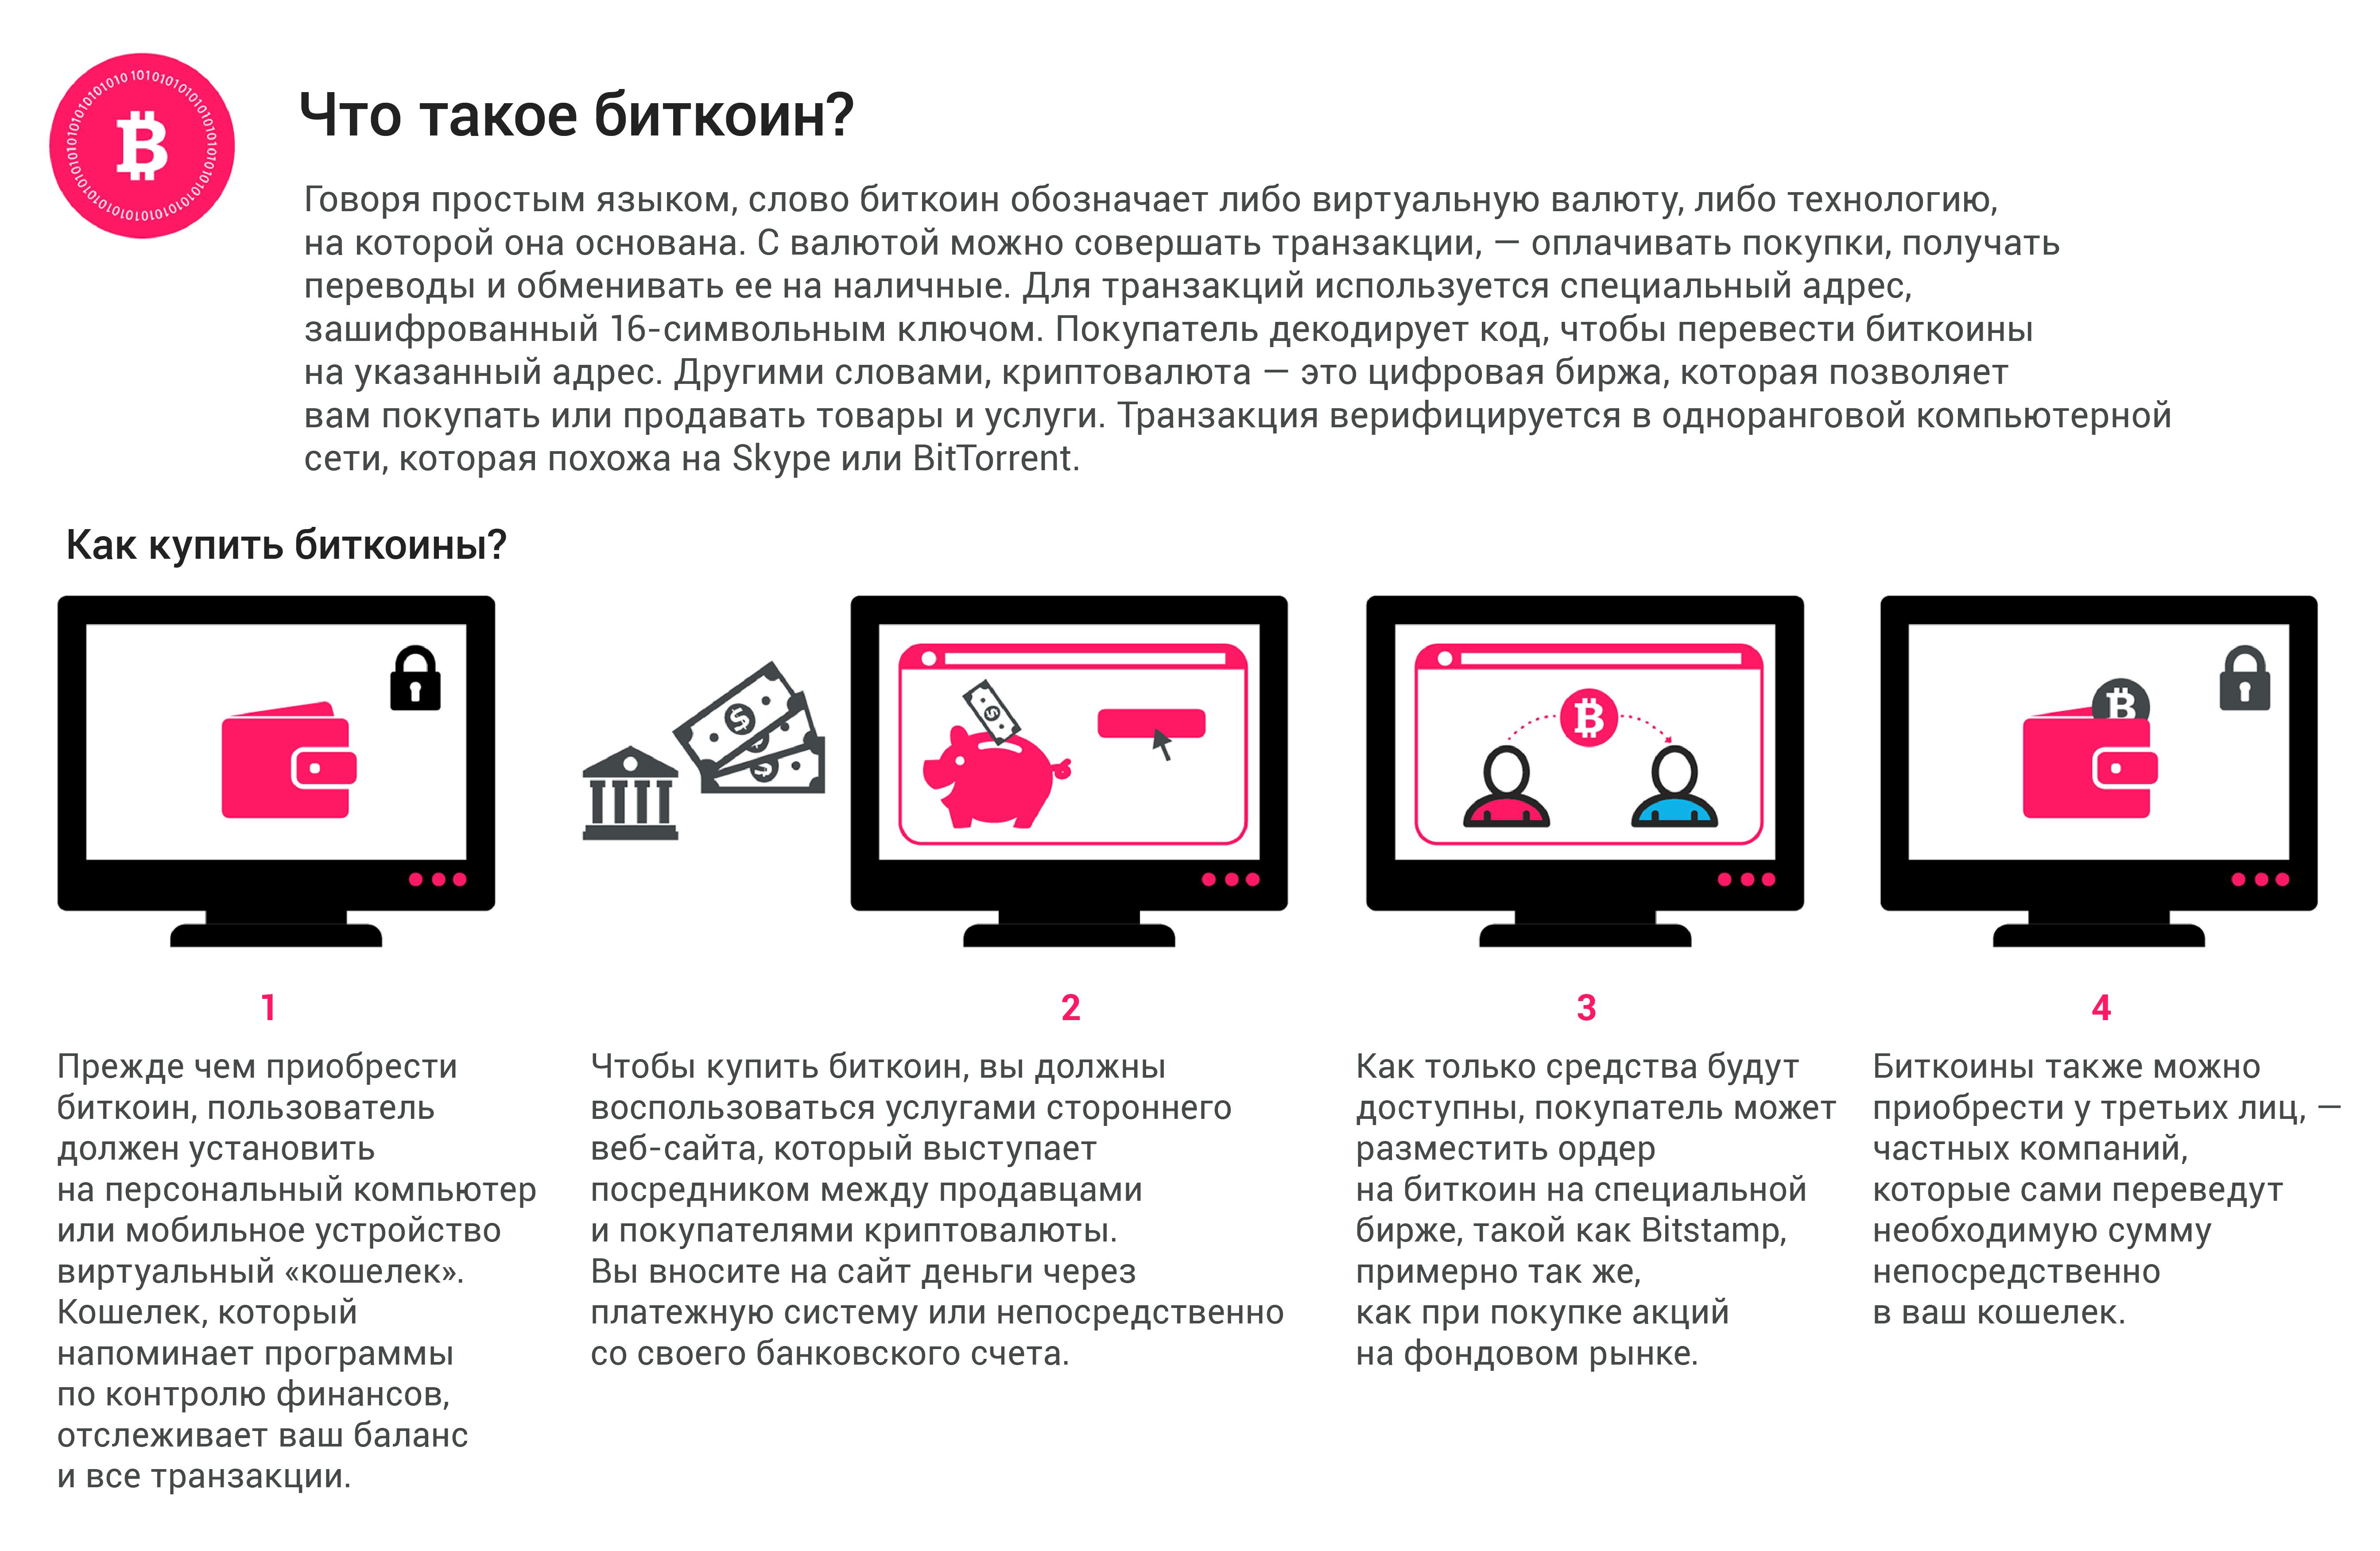 Пул криптовалюты майнинг онлайн на русском-15